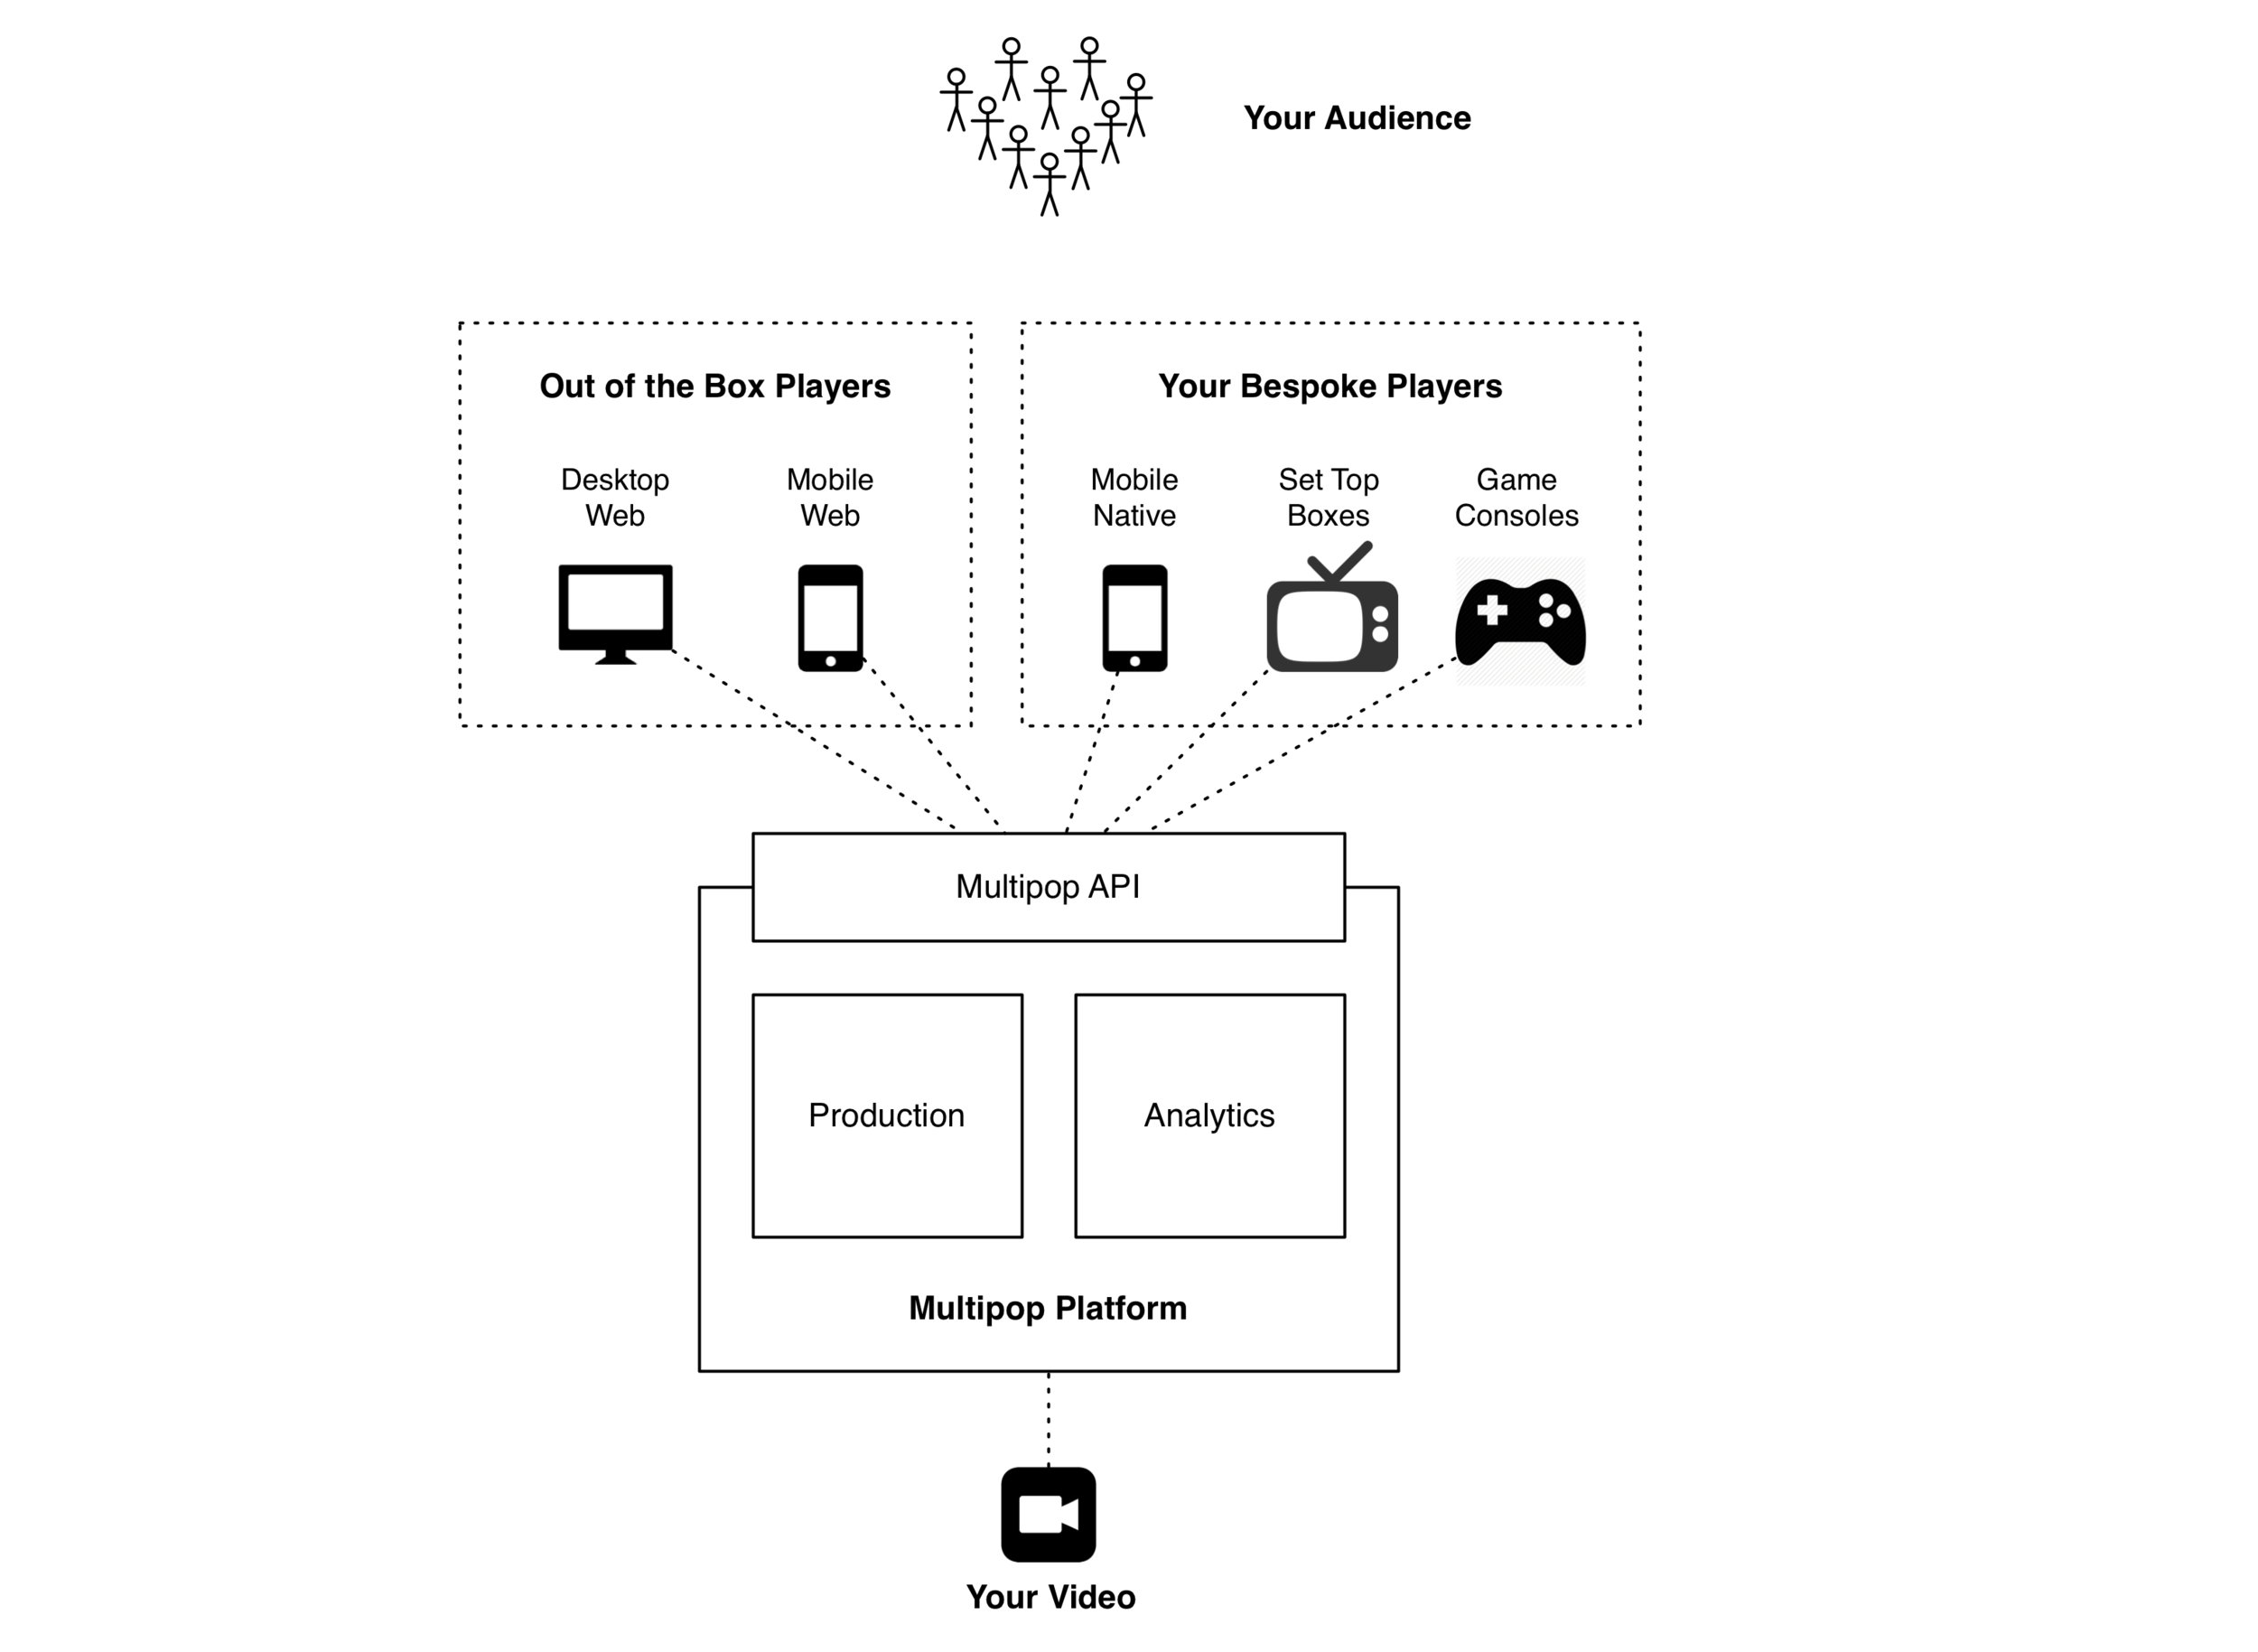 The Multipop Platform